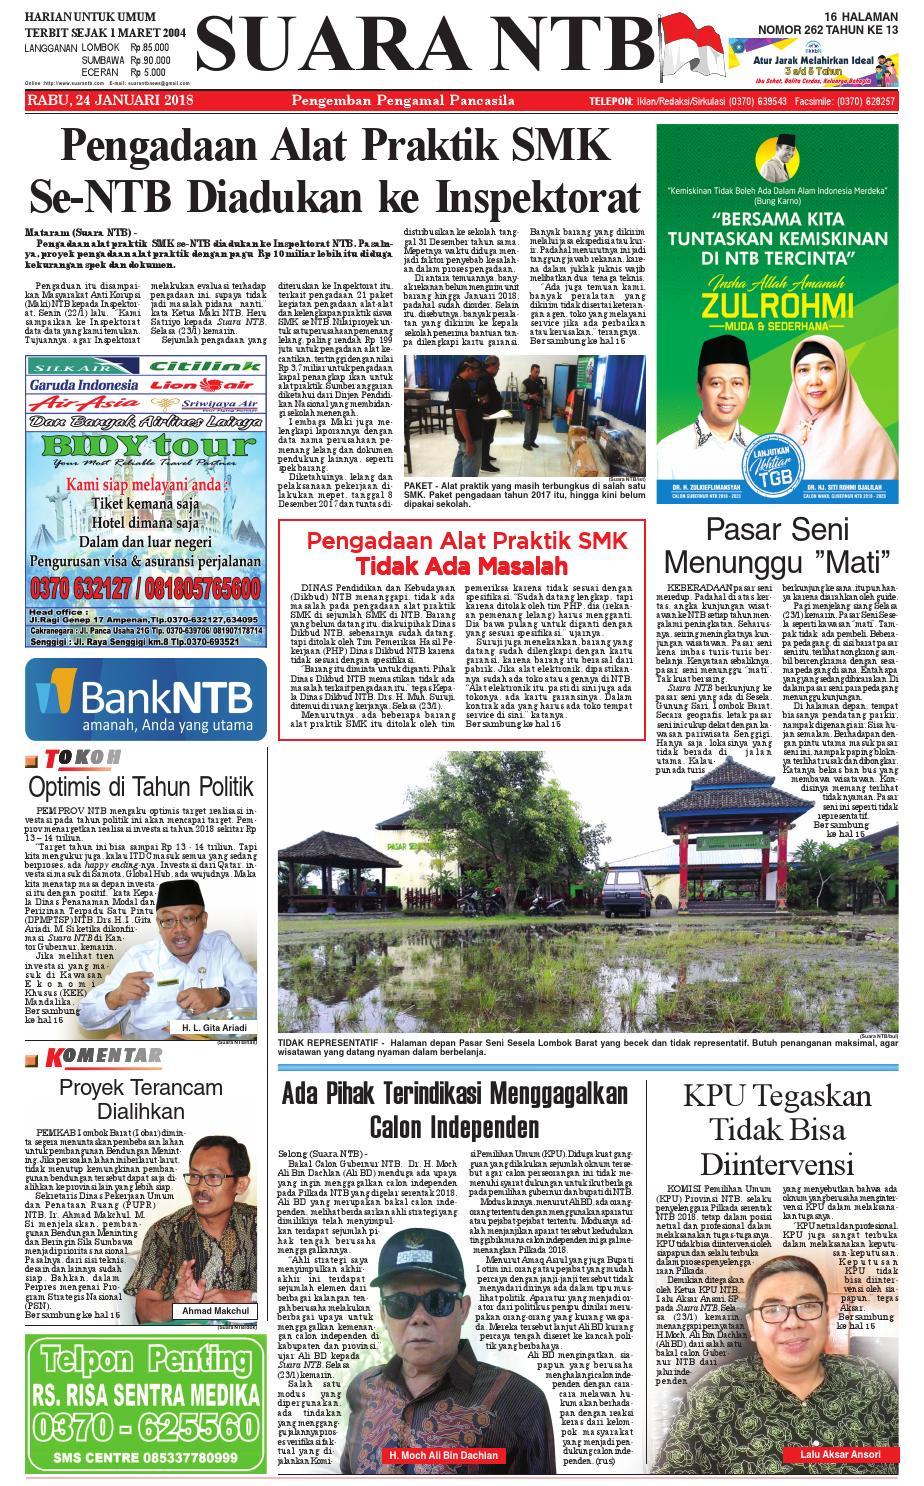 Edisi 24 Januari 2018 Suara Ntb By E Paper Kmb Issuu Parcel Makanan Ampamp Keramik Pja 1608